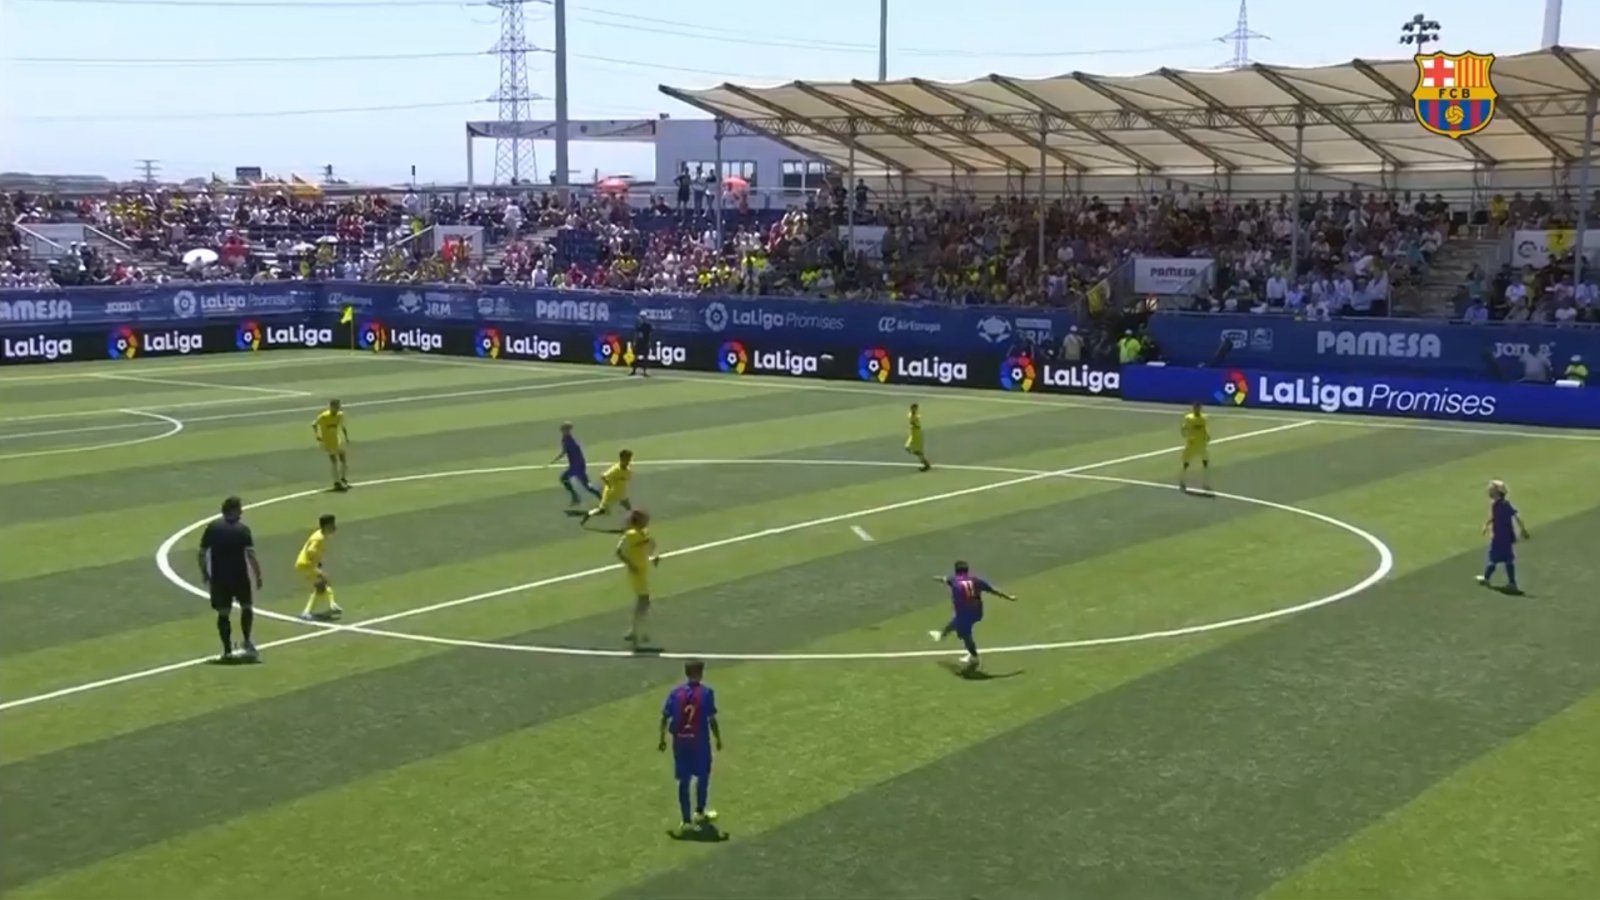 watch-barcelona-youngster-score-an-outrageous-wonder-goal